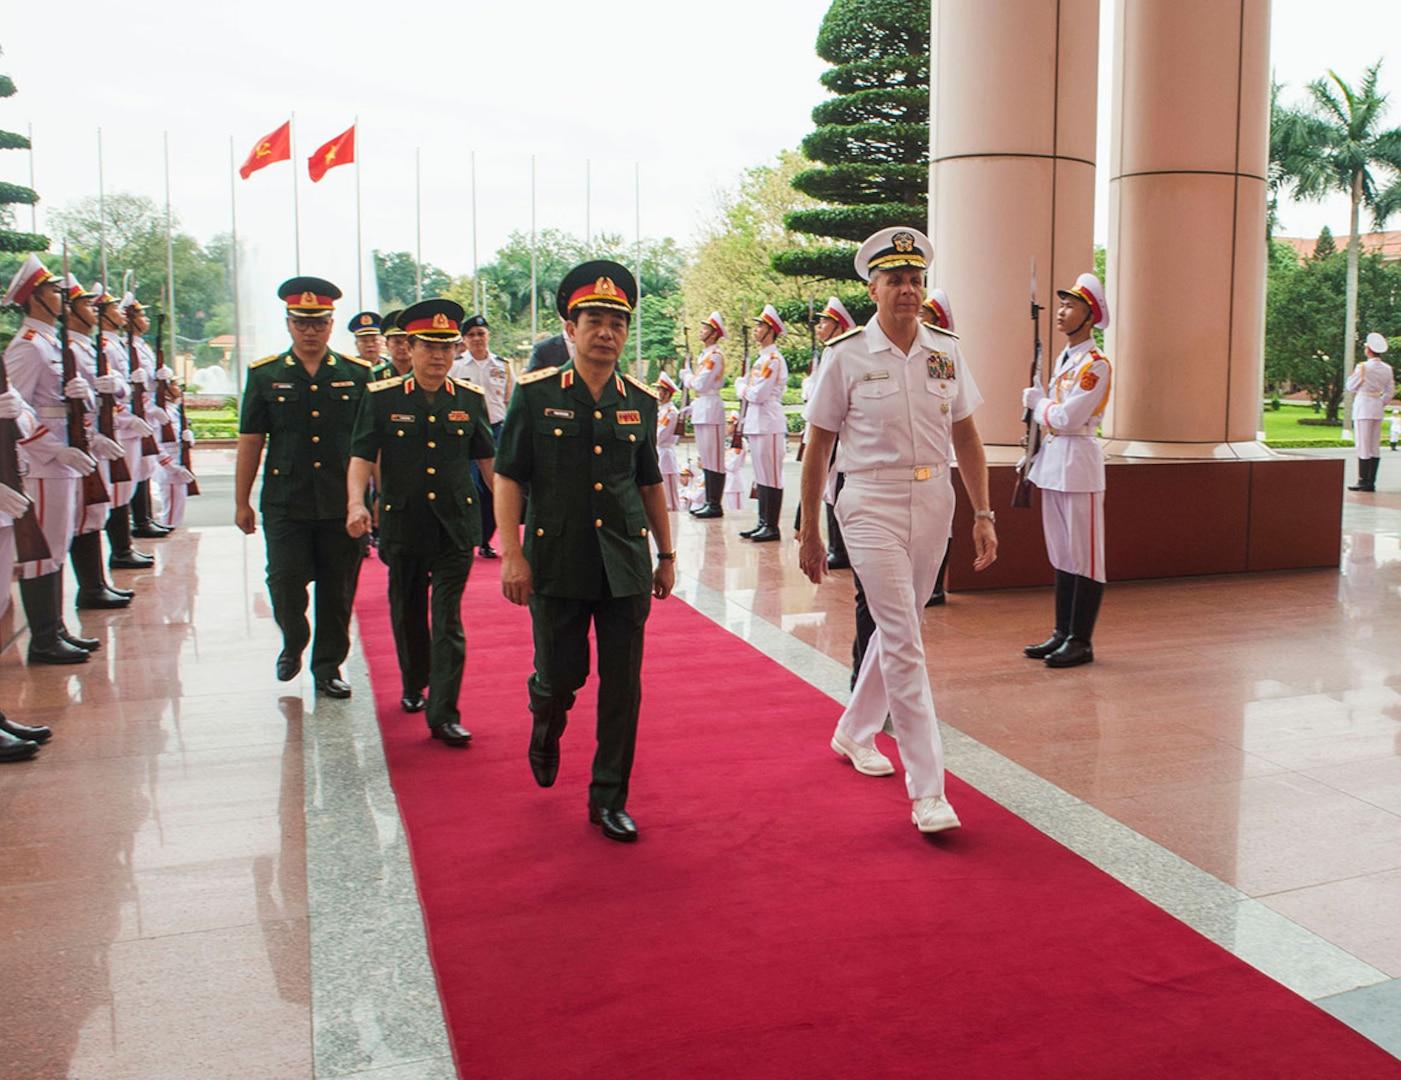 USINDOPACOM commander visits in Vietnam